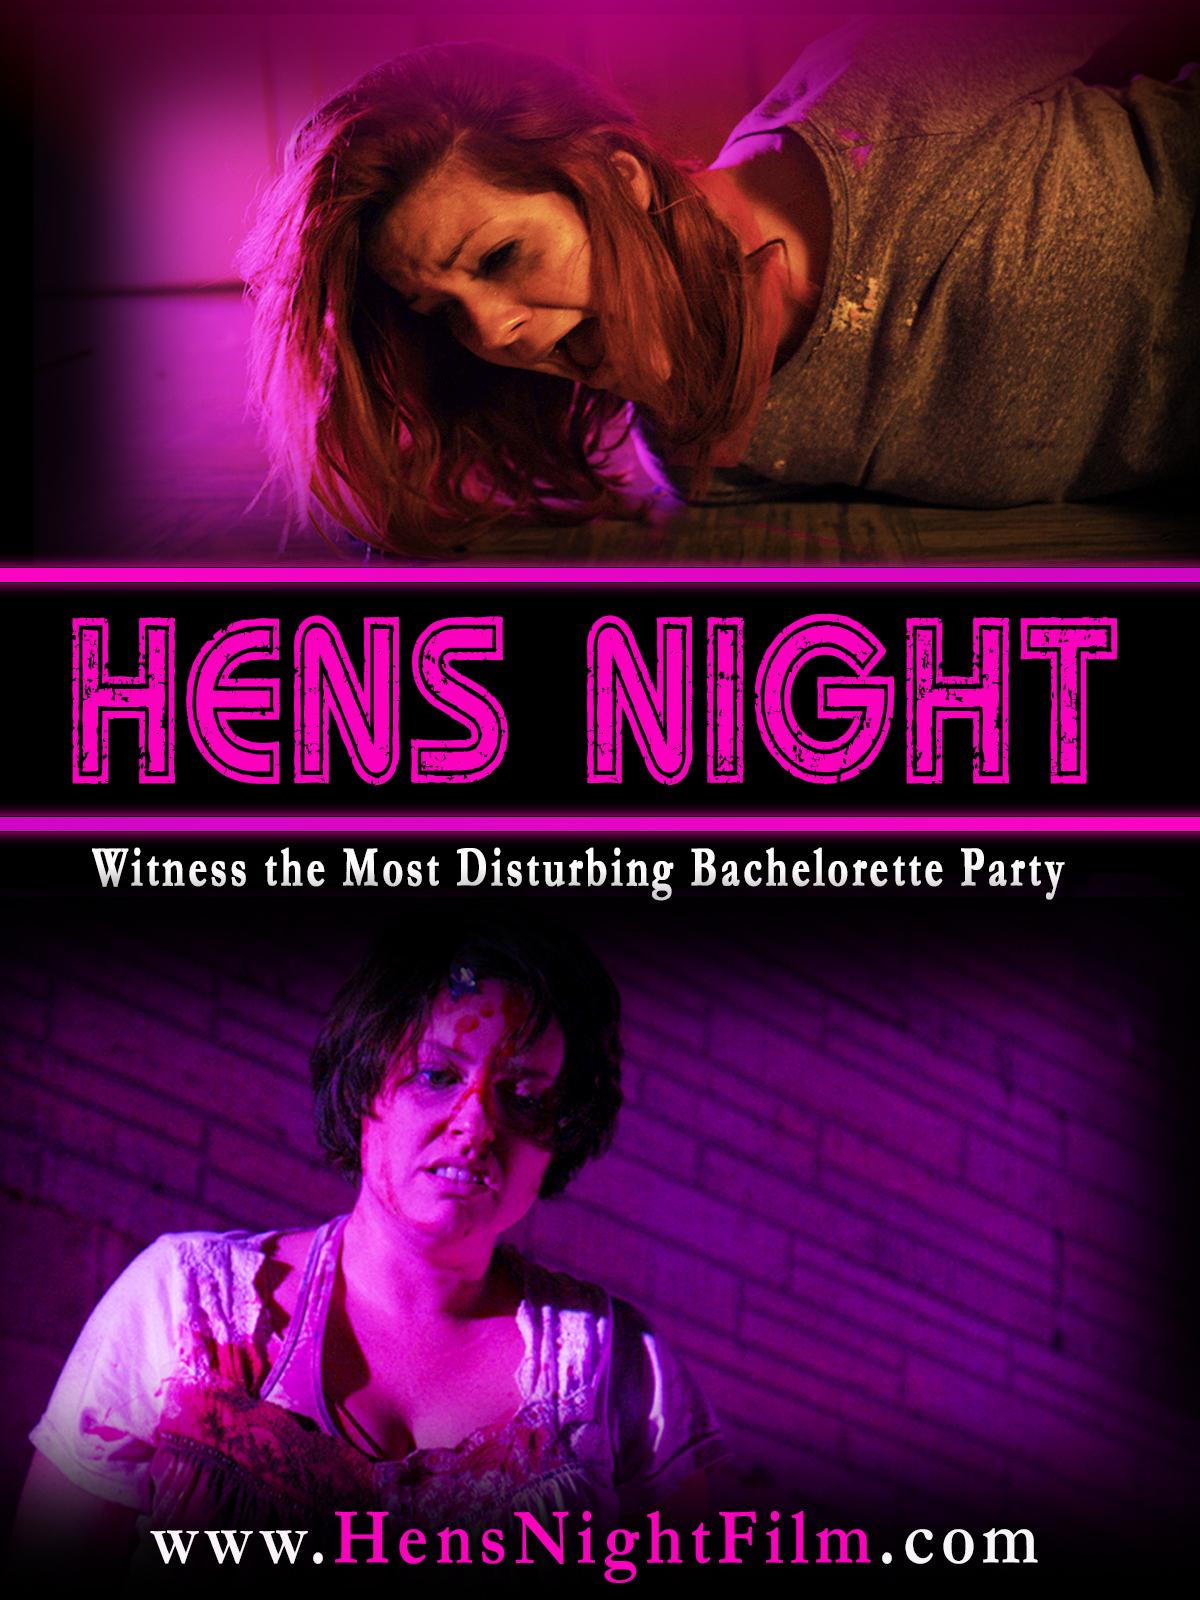 Hens Night 3x4